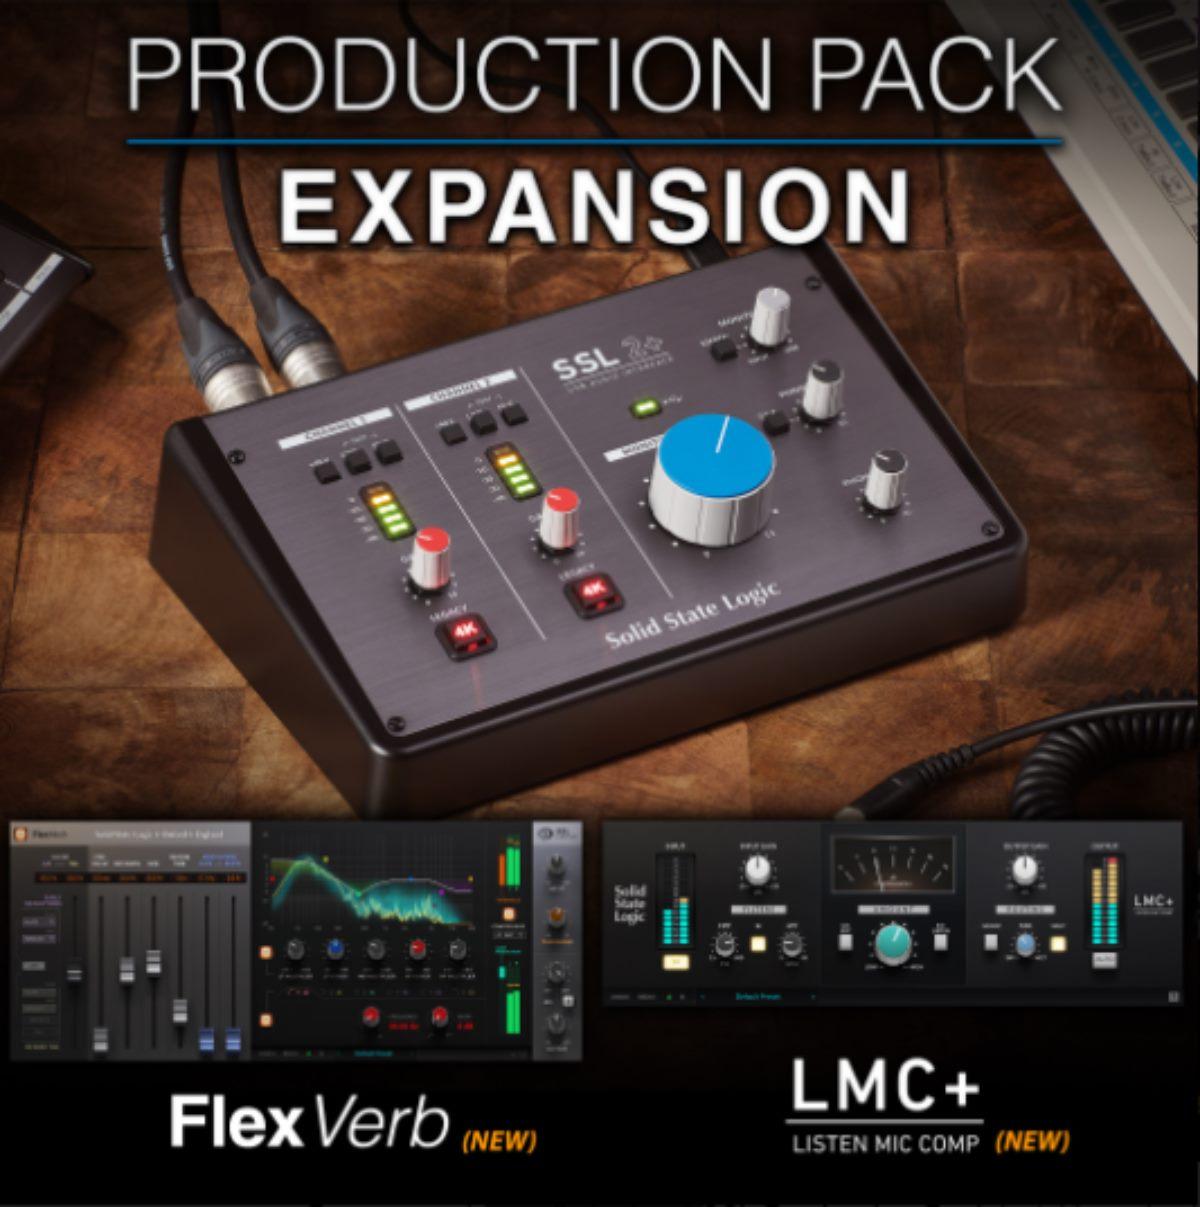 Promoción de SSL Production Pack Expansion, FlexVerb y LMC+